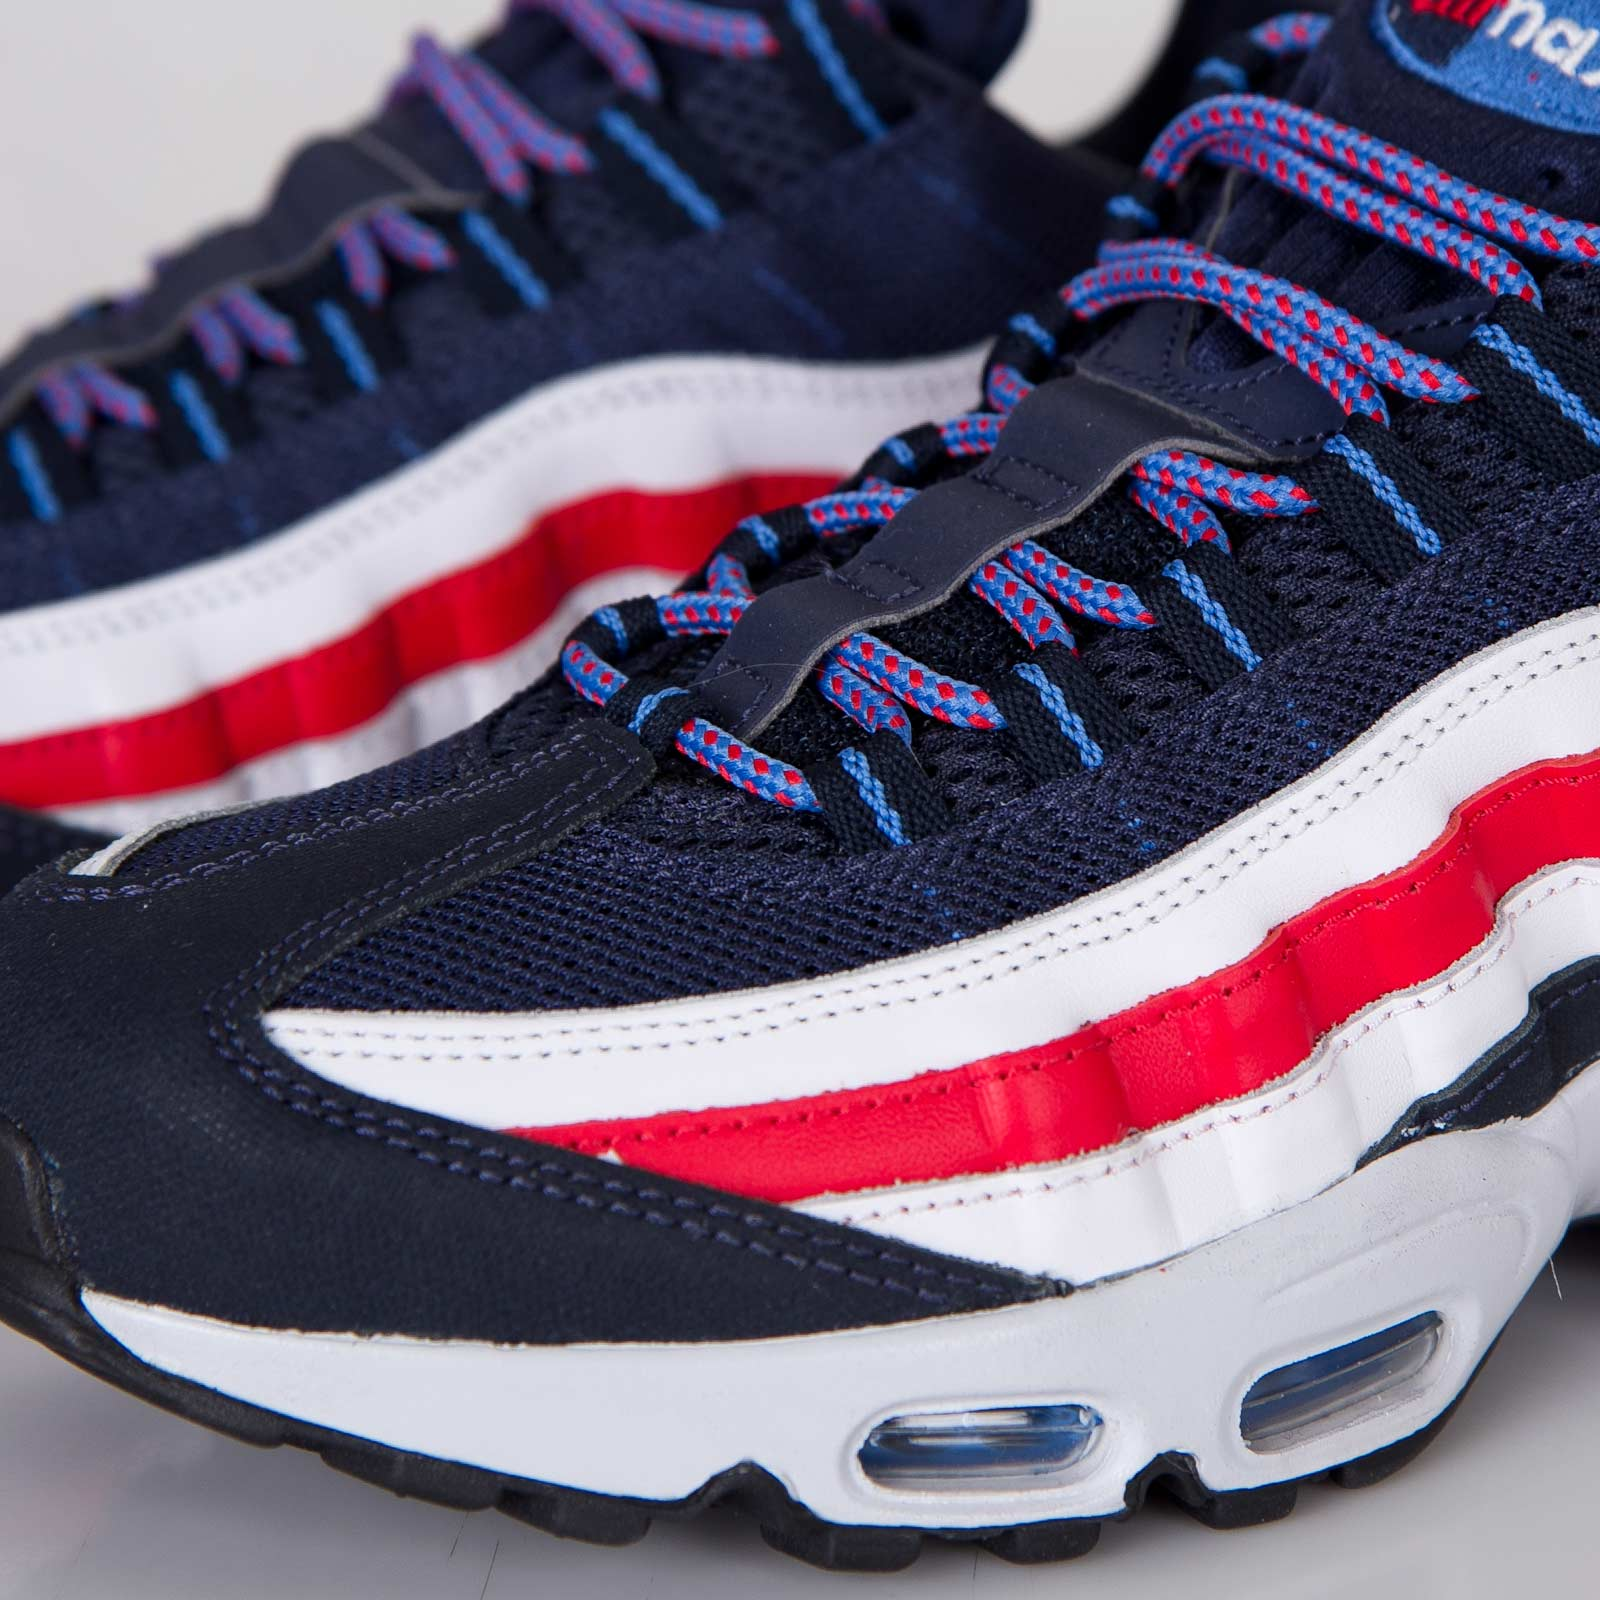 Nike Air Max 95 City QS 667637 400 Sneakersnstuff